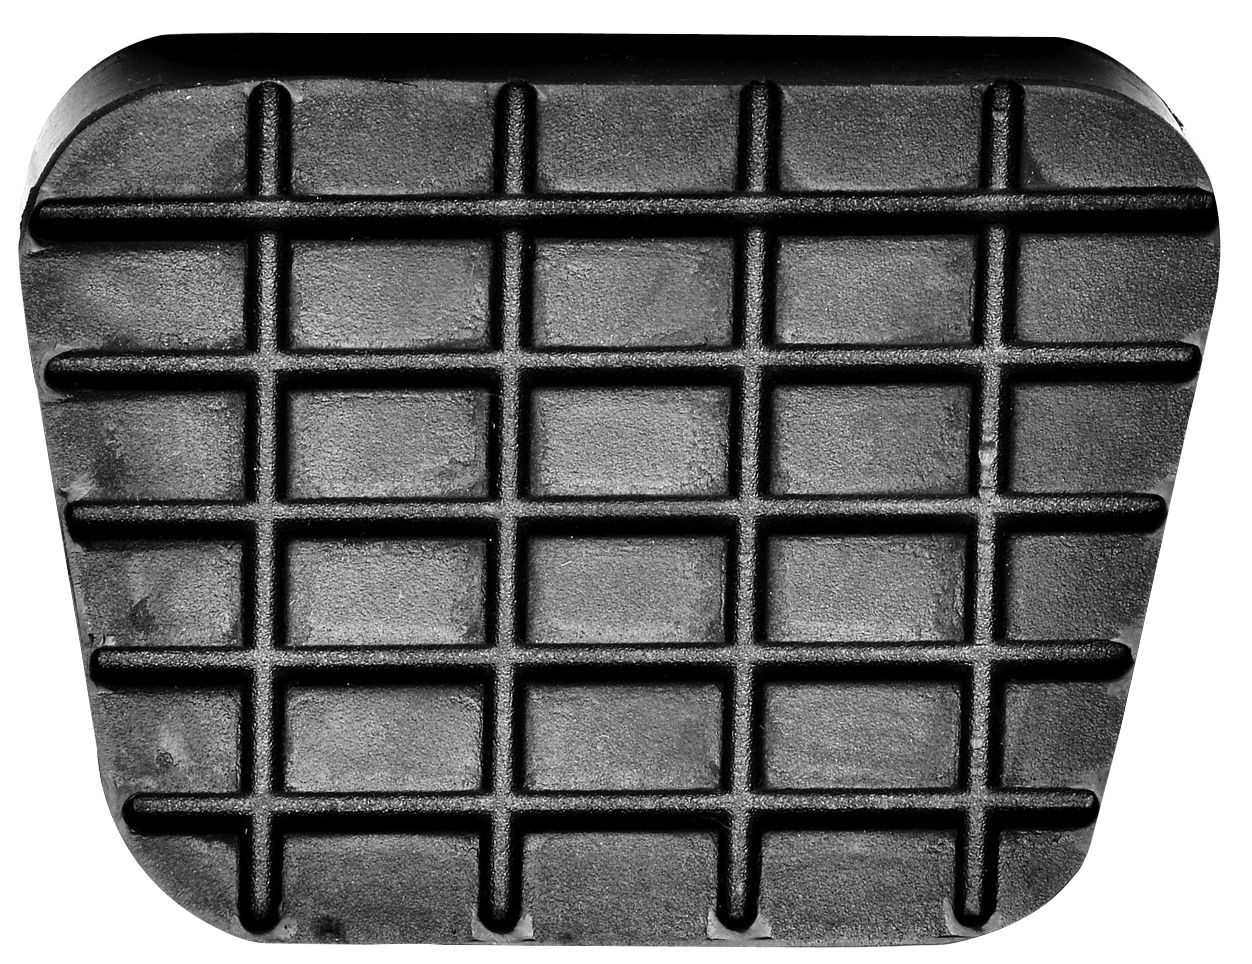 1960-72 C10 brake/clutch pedal pad standard